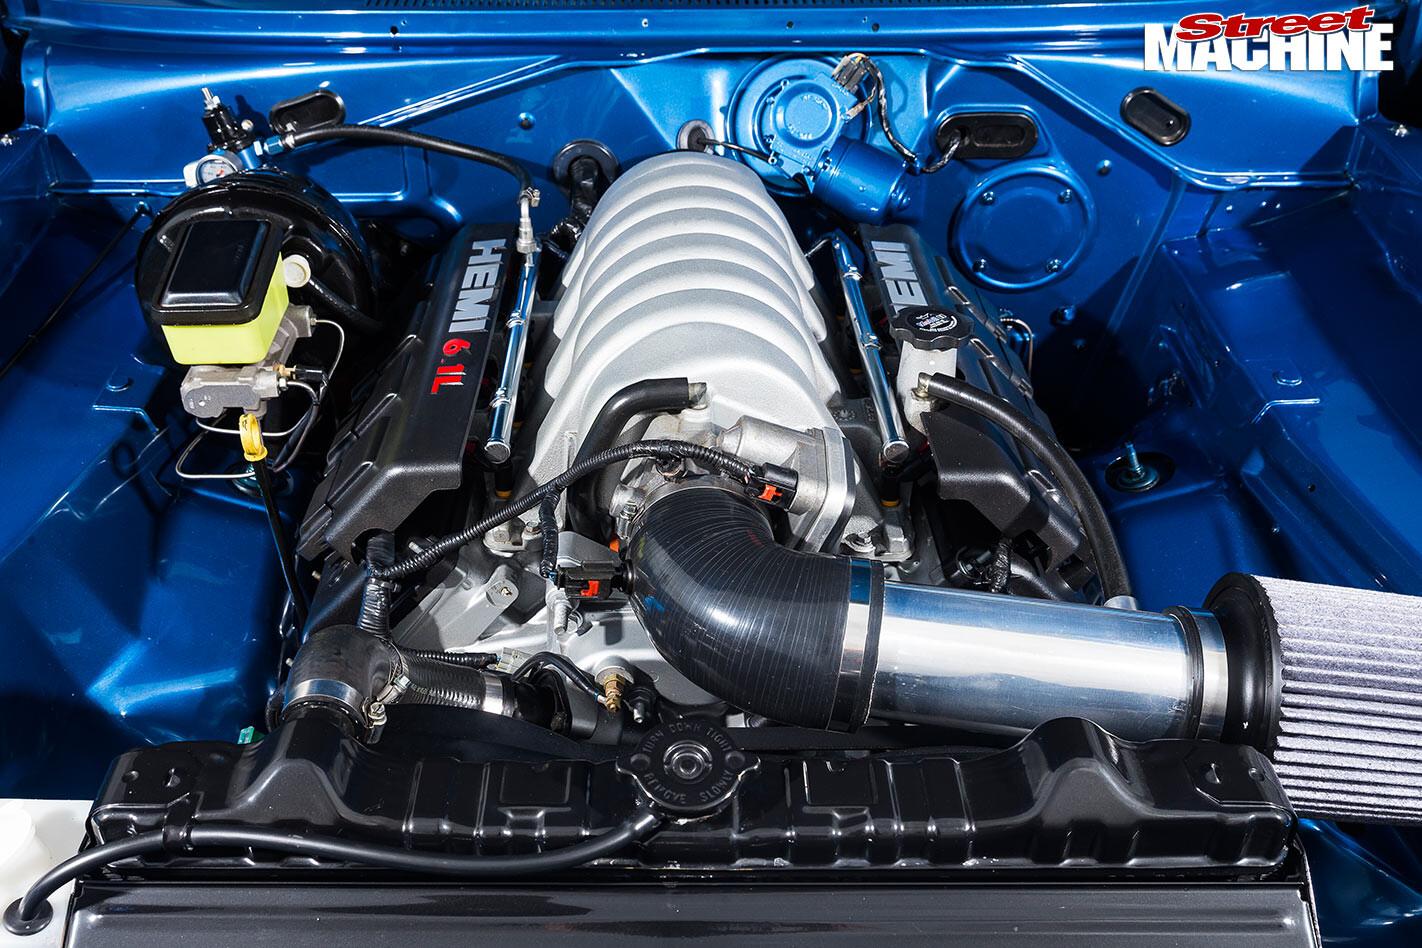 Valiant VJ Regal engine bay